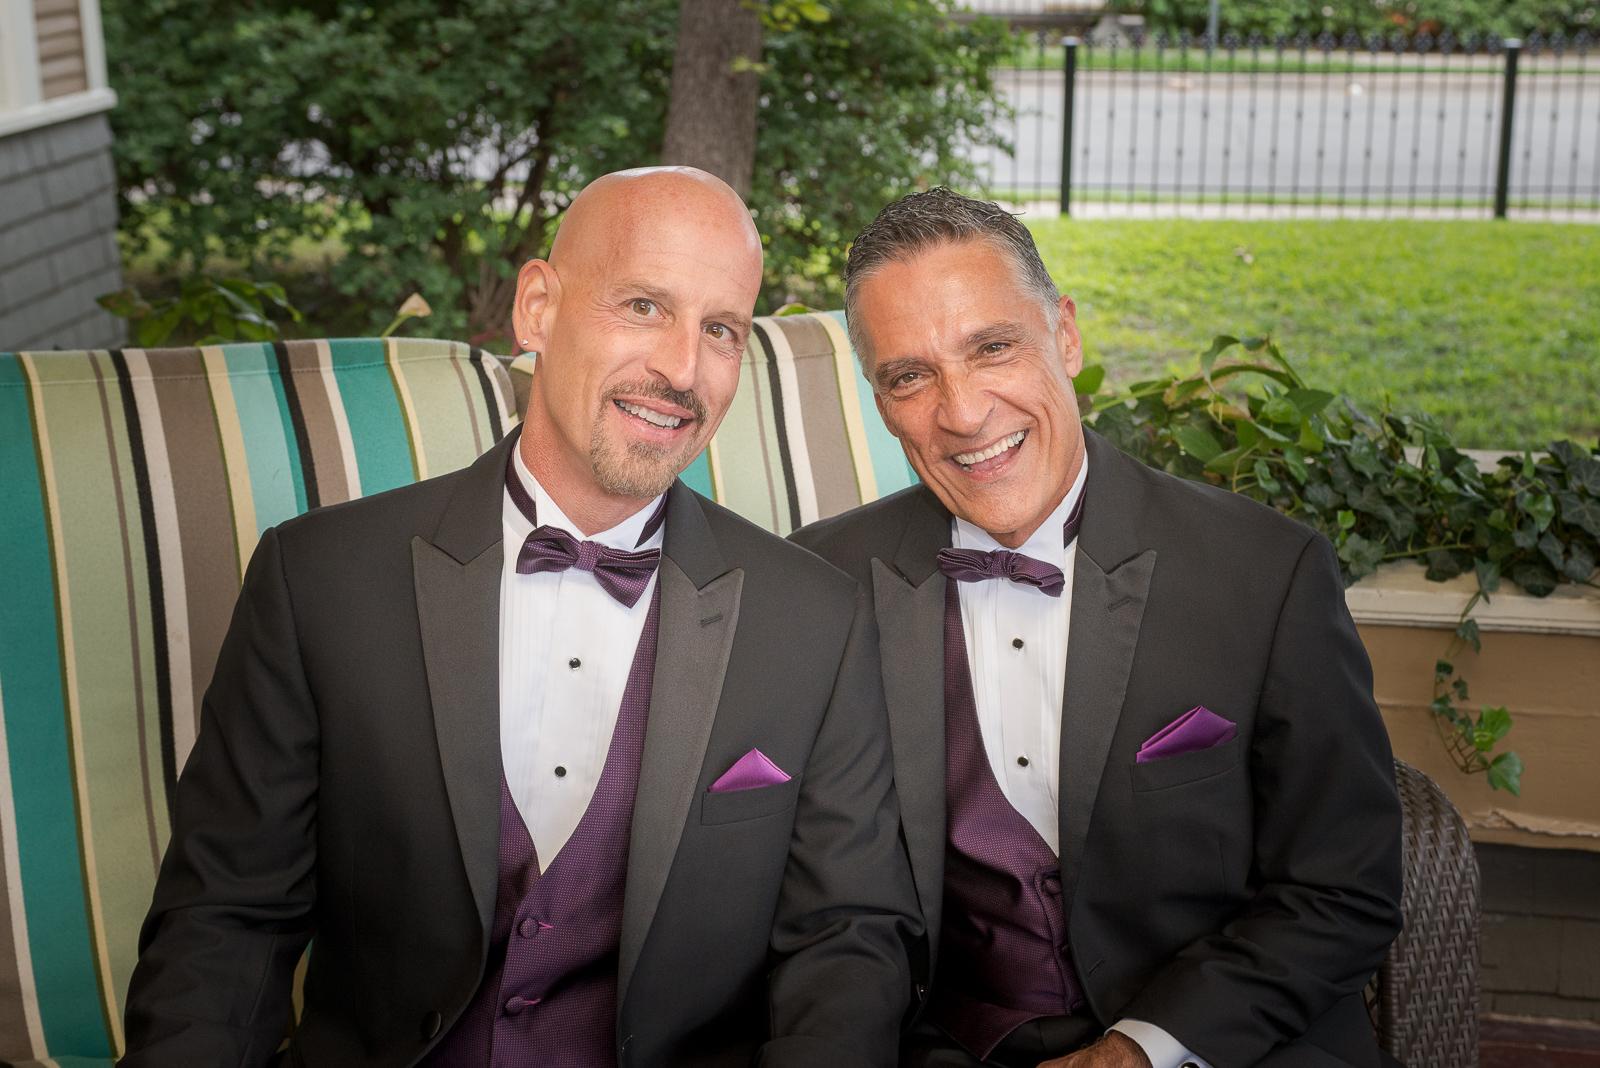 Michael-Napier-Weddings-Ludwig-Guilbeau Wedding-20 (5).jpg